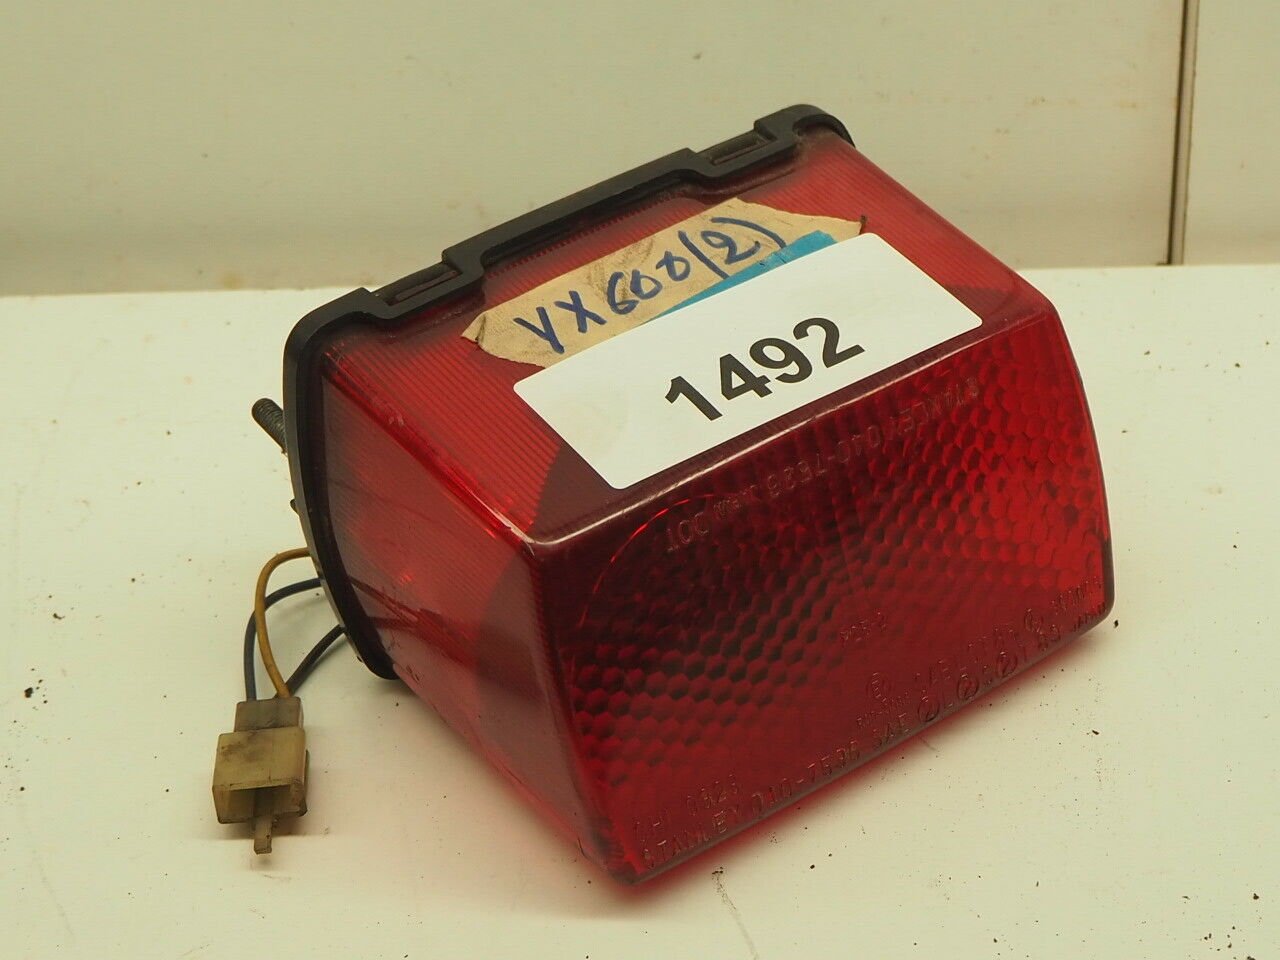 YAMAHA YX600 RADIAN REAR TAIL LIGHT ACHTERLICHT 1UJ-84710-A0